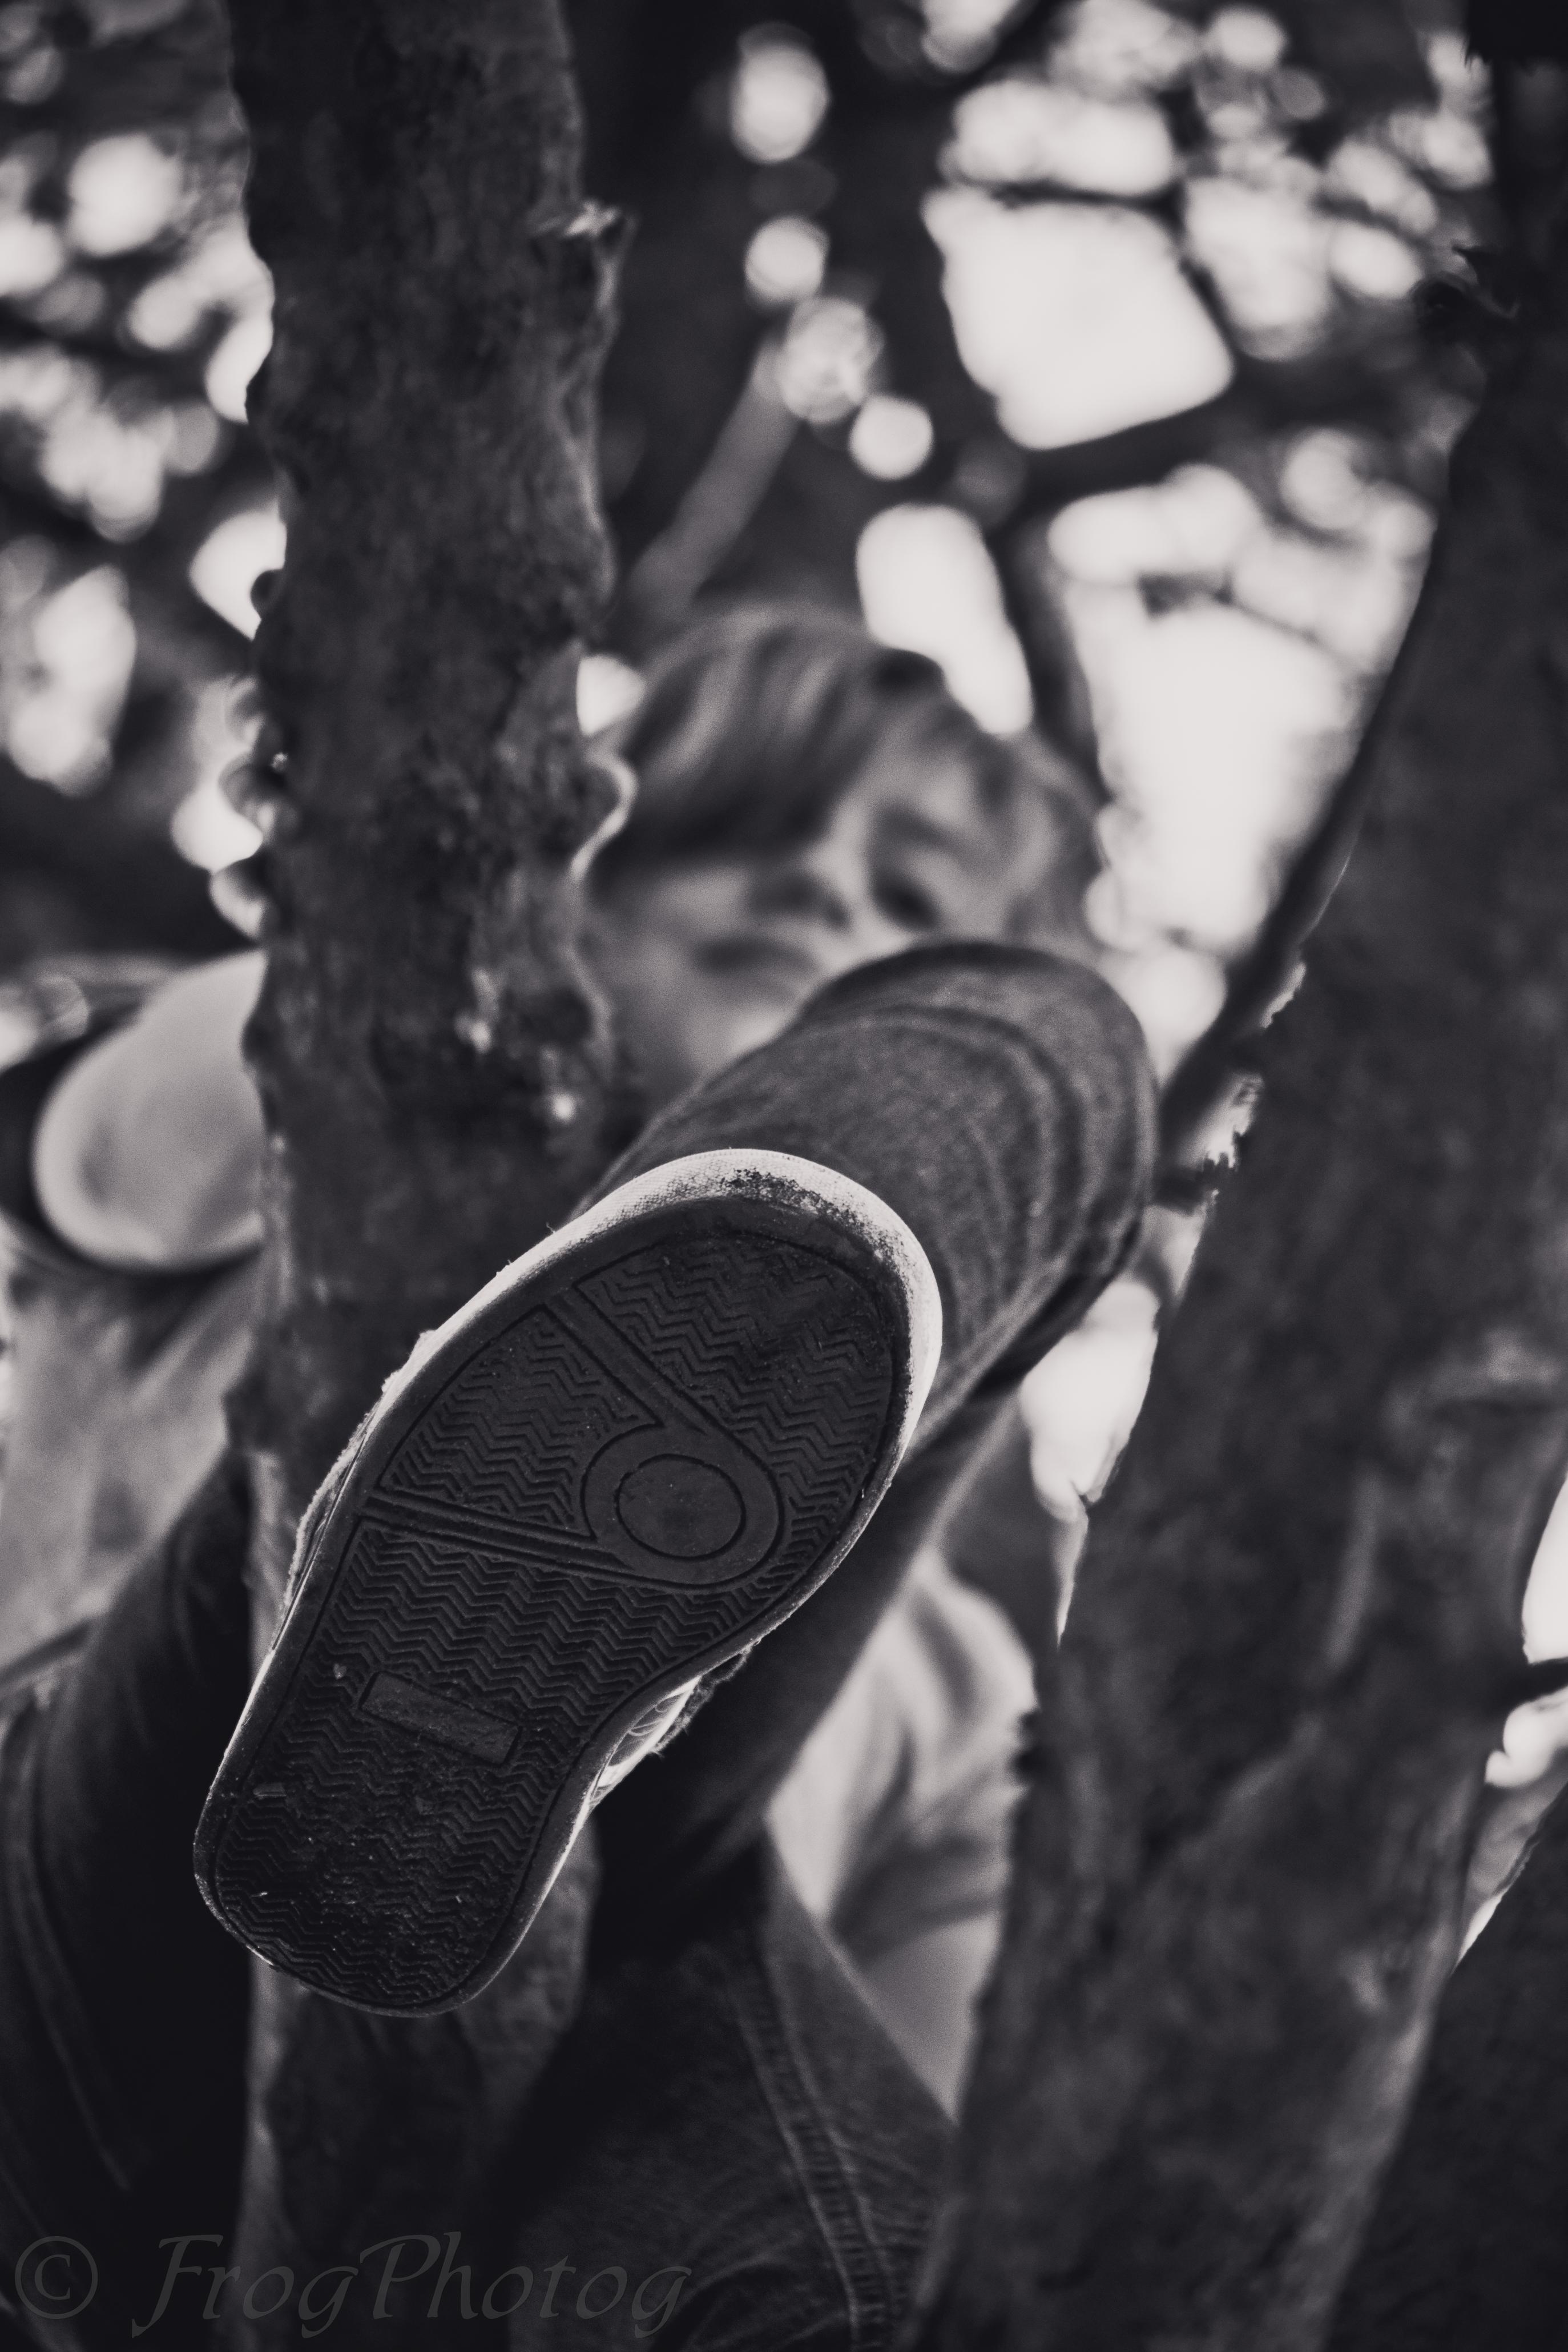 87/365 ~ The Climb